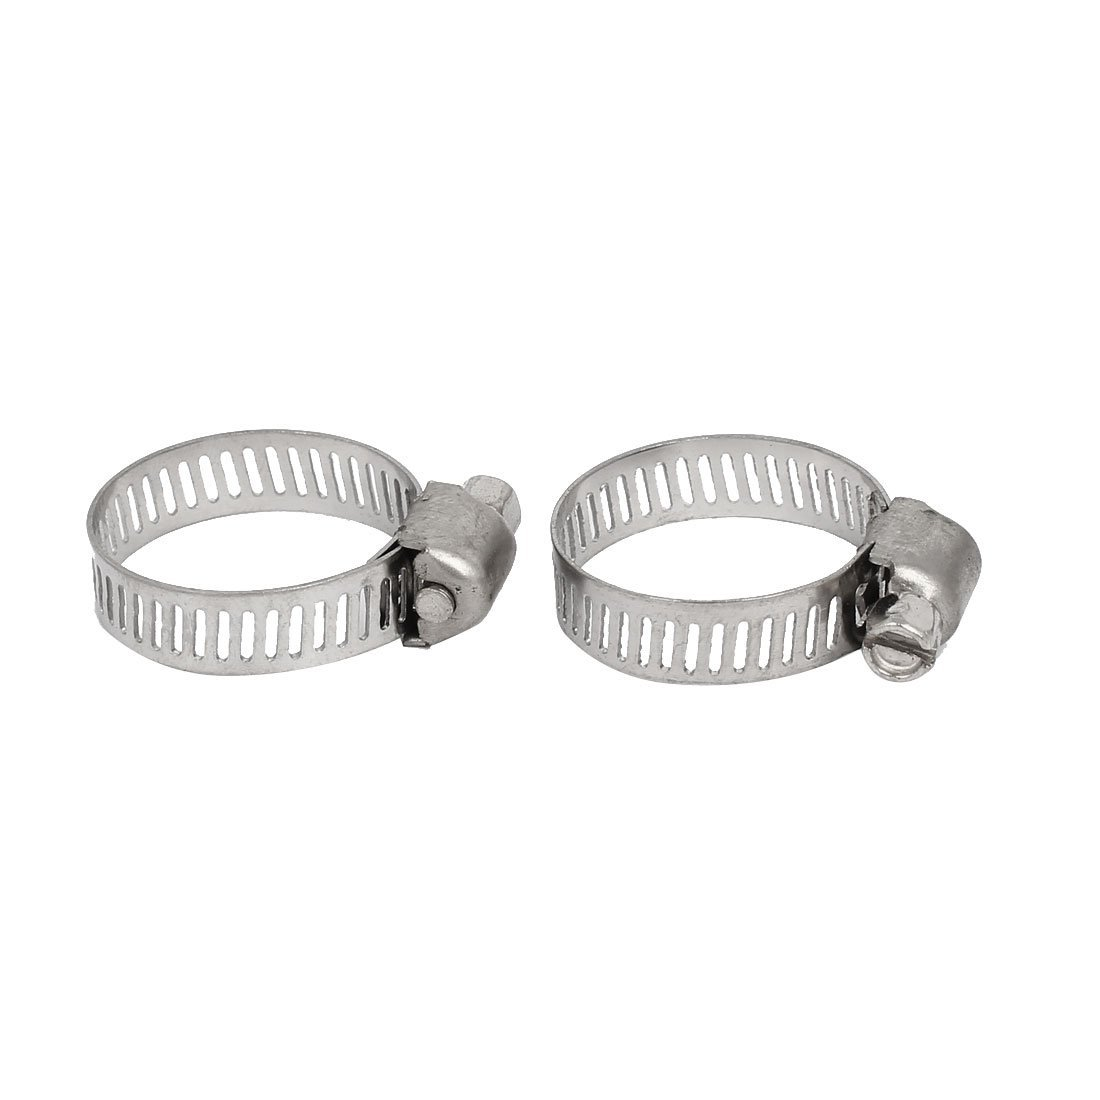 Hindi Kinakalawang Na Asero Adjustable Cable Masikip Worm EbuyChX 16-25mm Gear Hose Clamps 100pcs